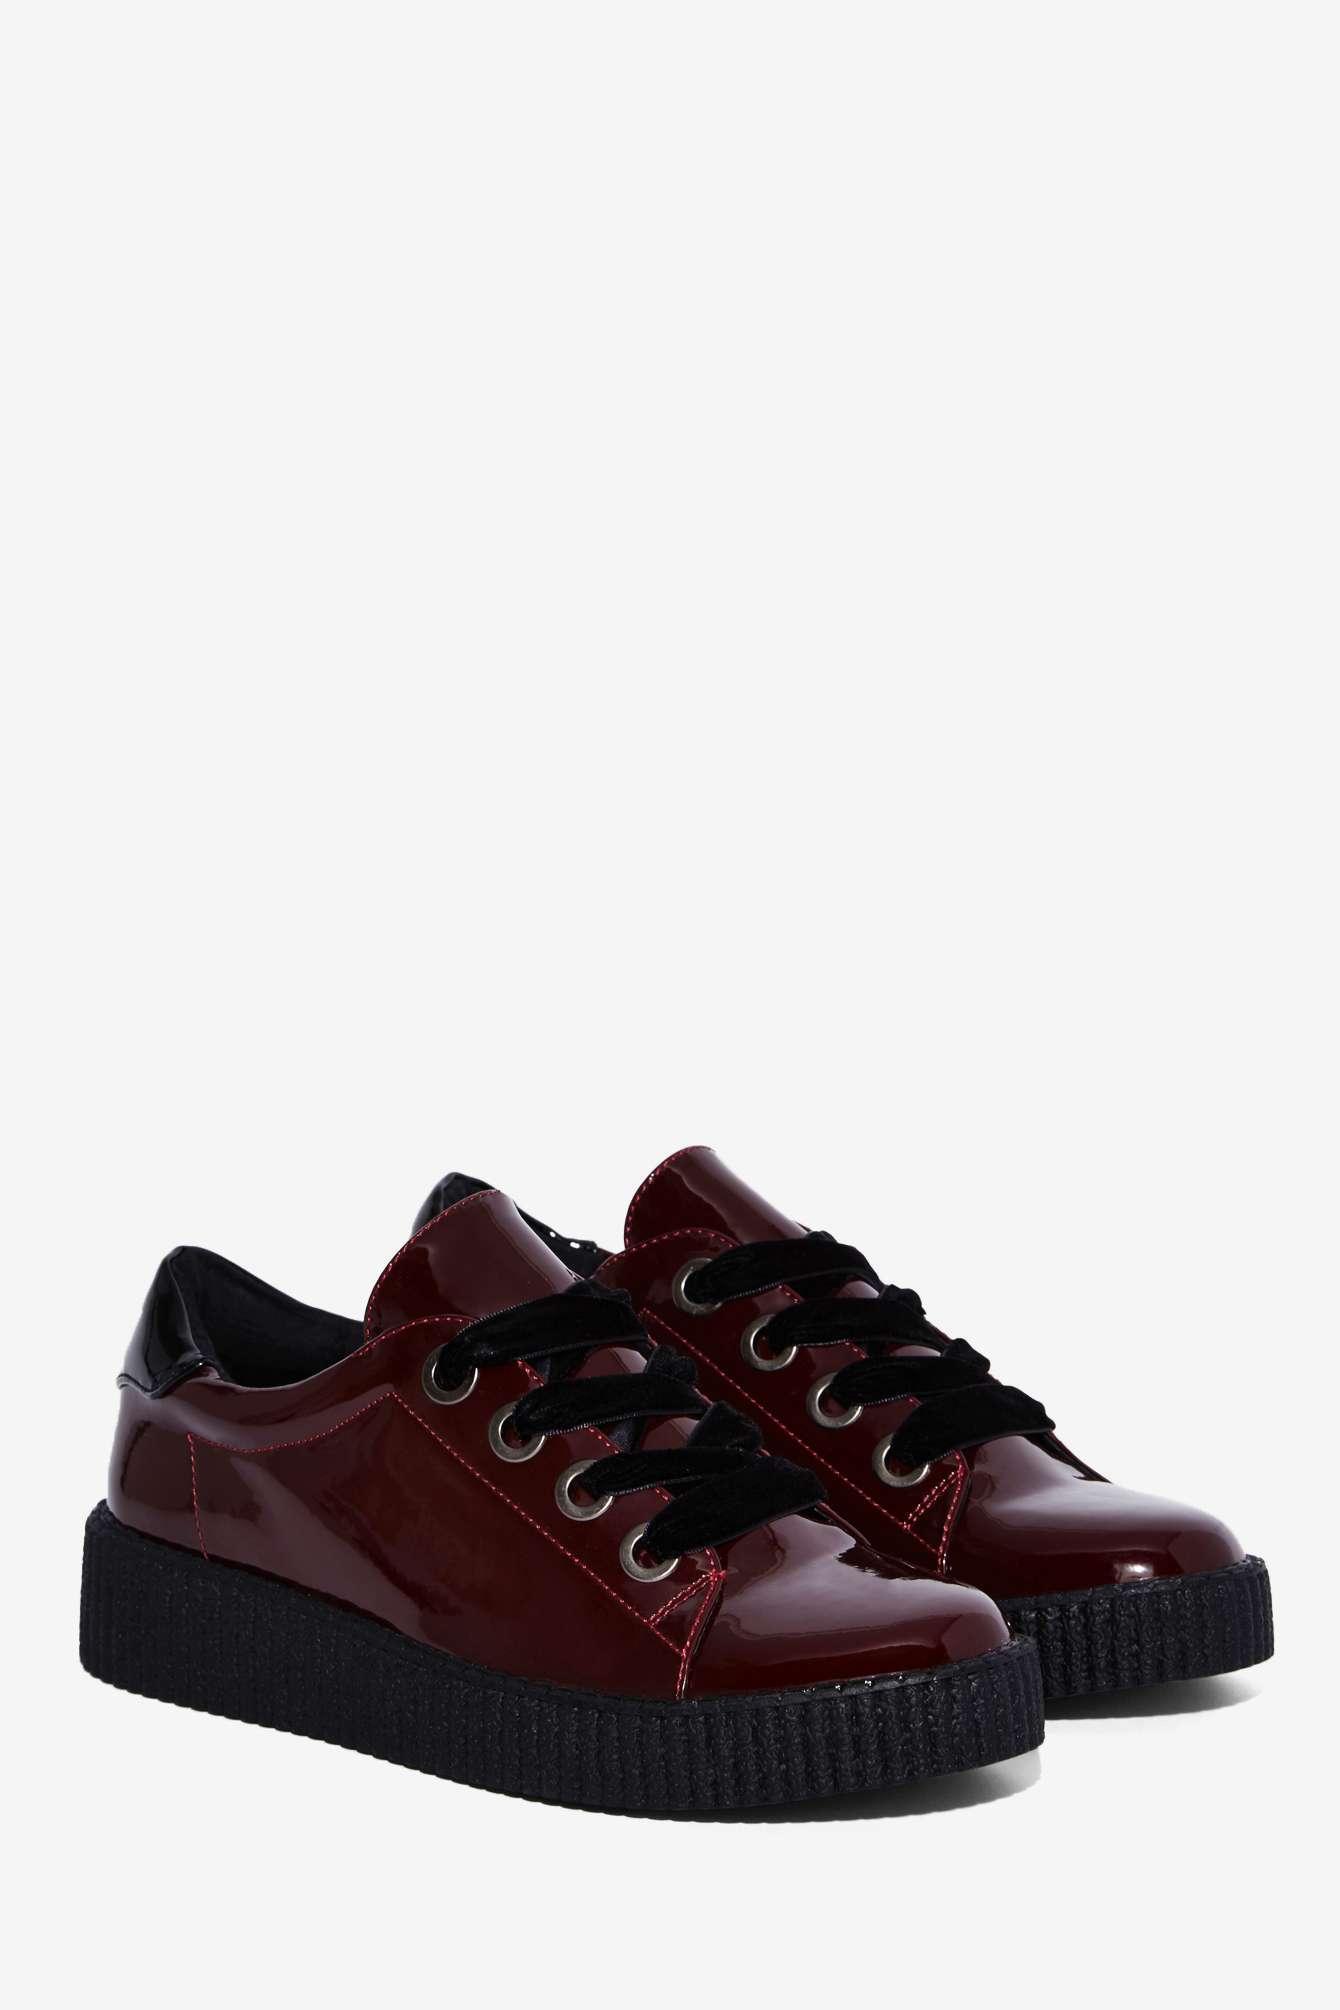 Warwick Shoe Stores